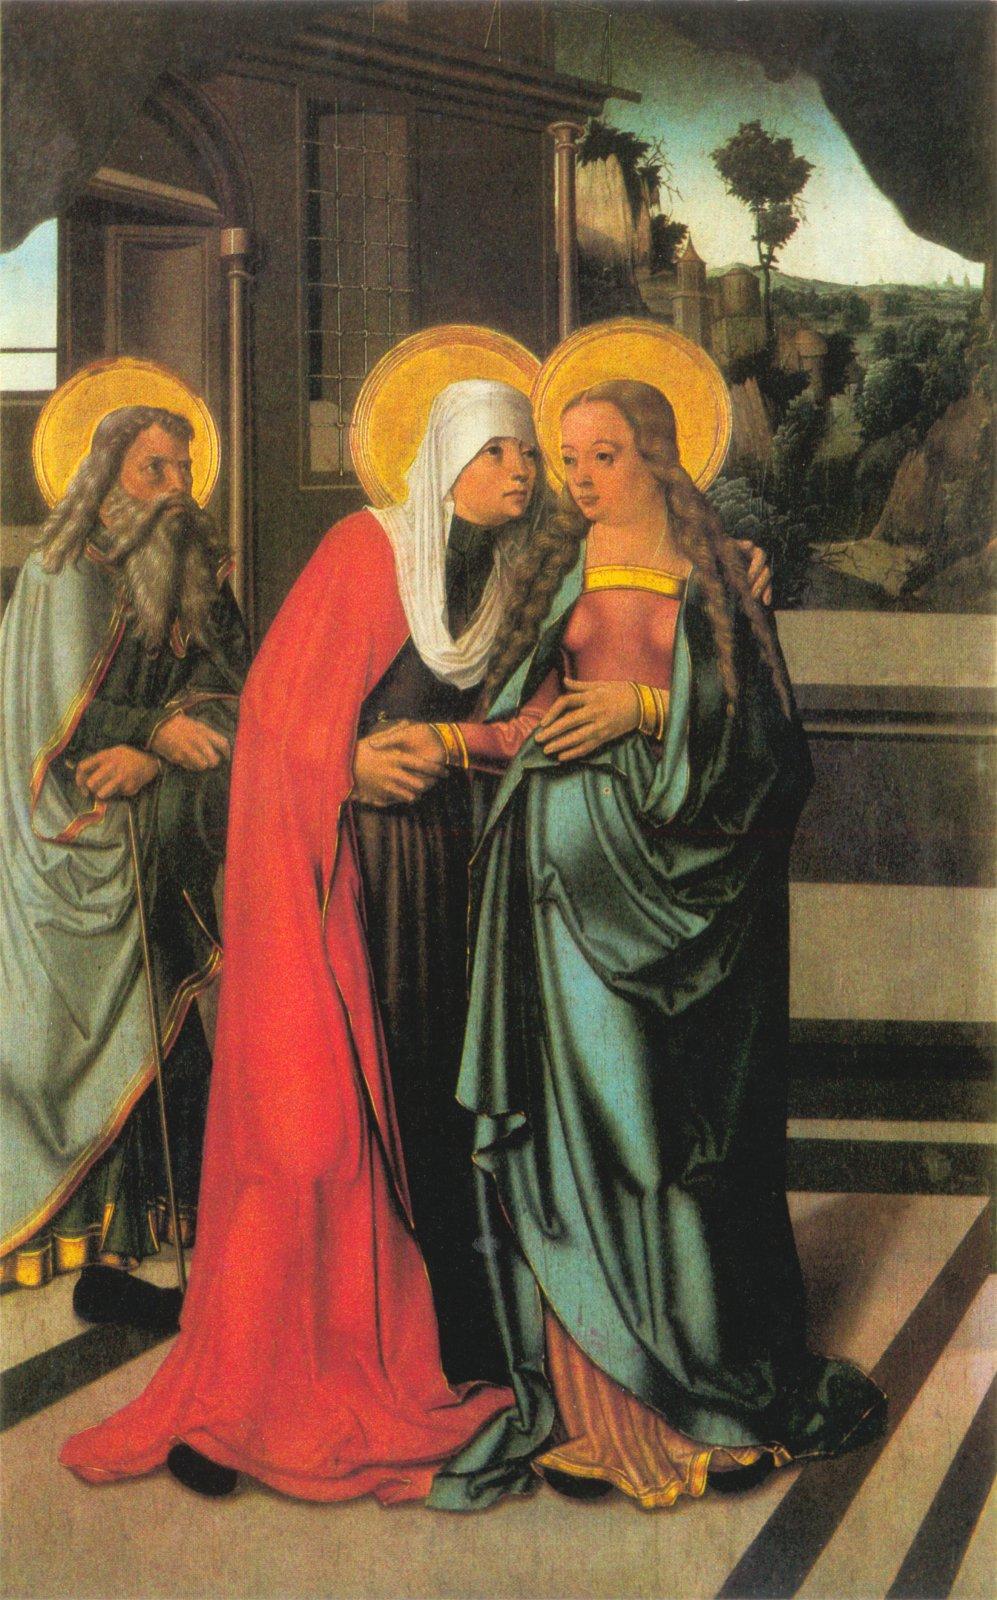 Litomerice_Altarpiece-The_Visitation.jpg